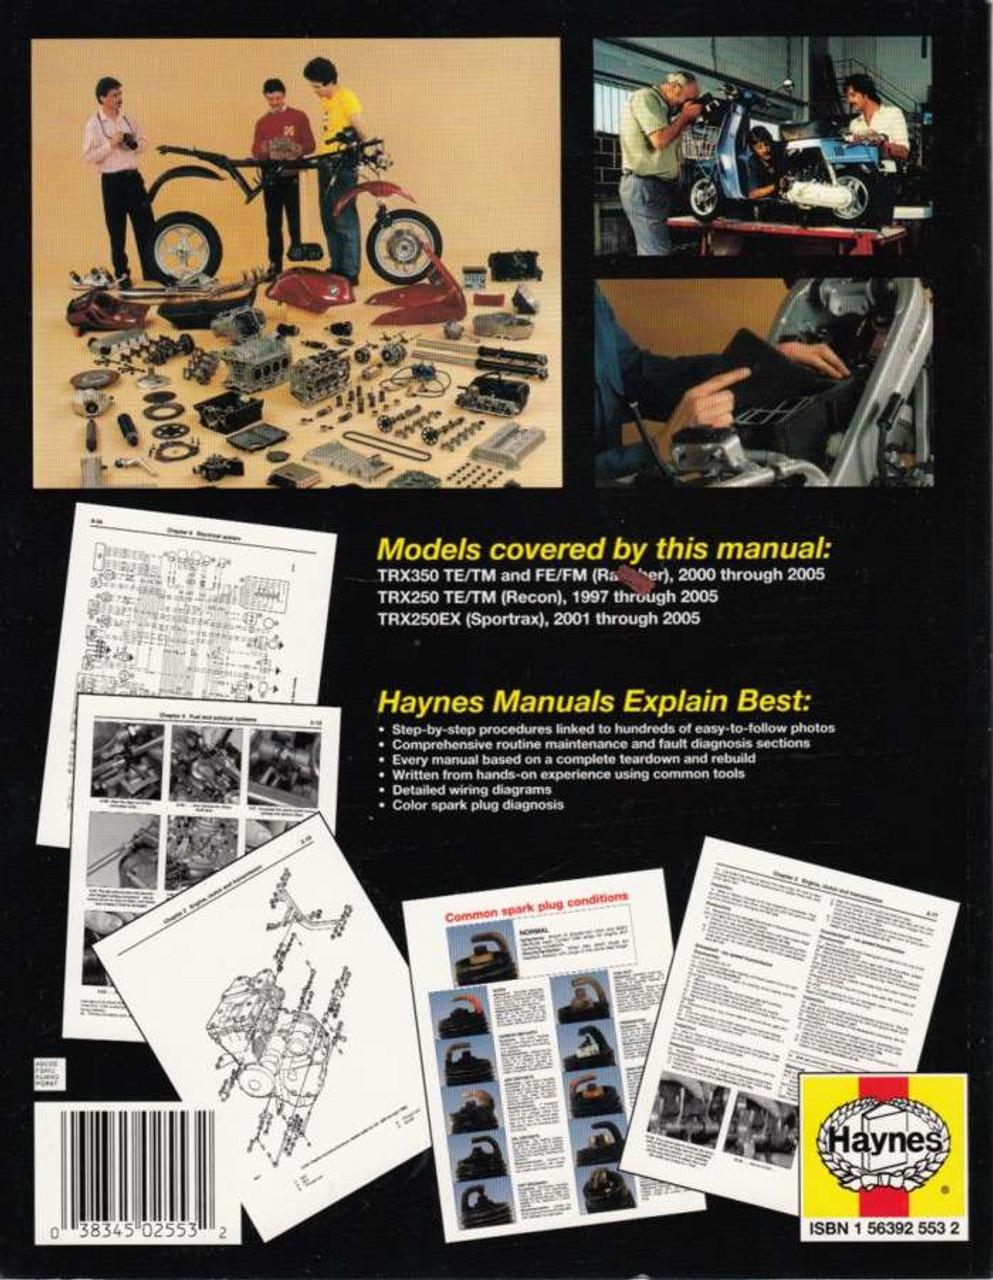 small resolution of  honda trx350 rancher trx250 recon trx250ex sportrax atvs 1997 2005 workshop manual back